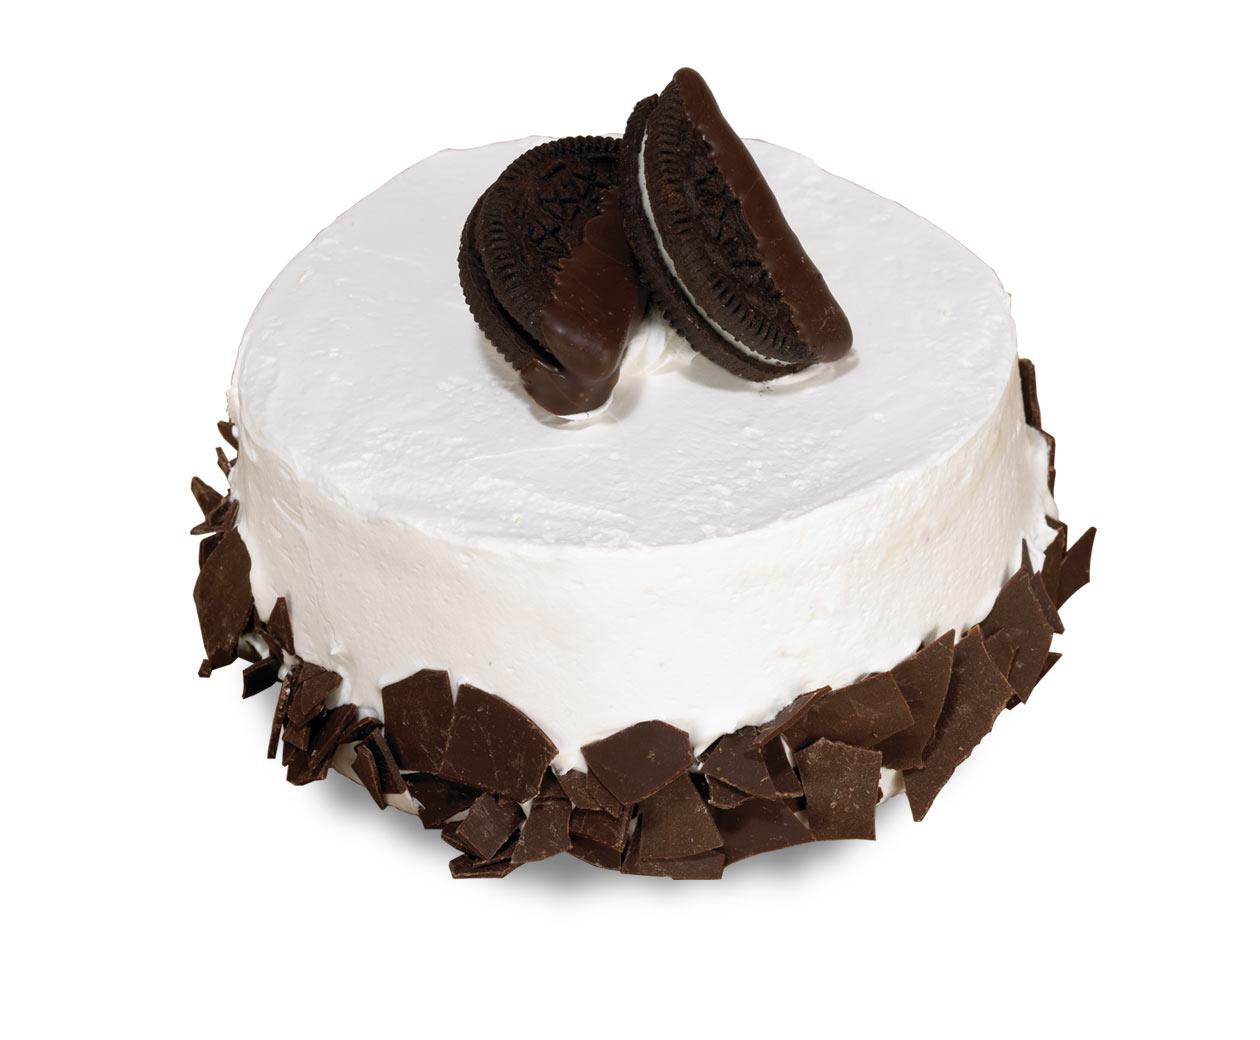 Cold Stone Cake Batter Ice Cream